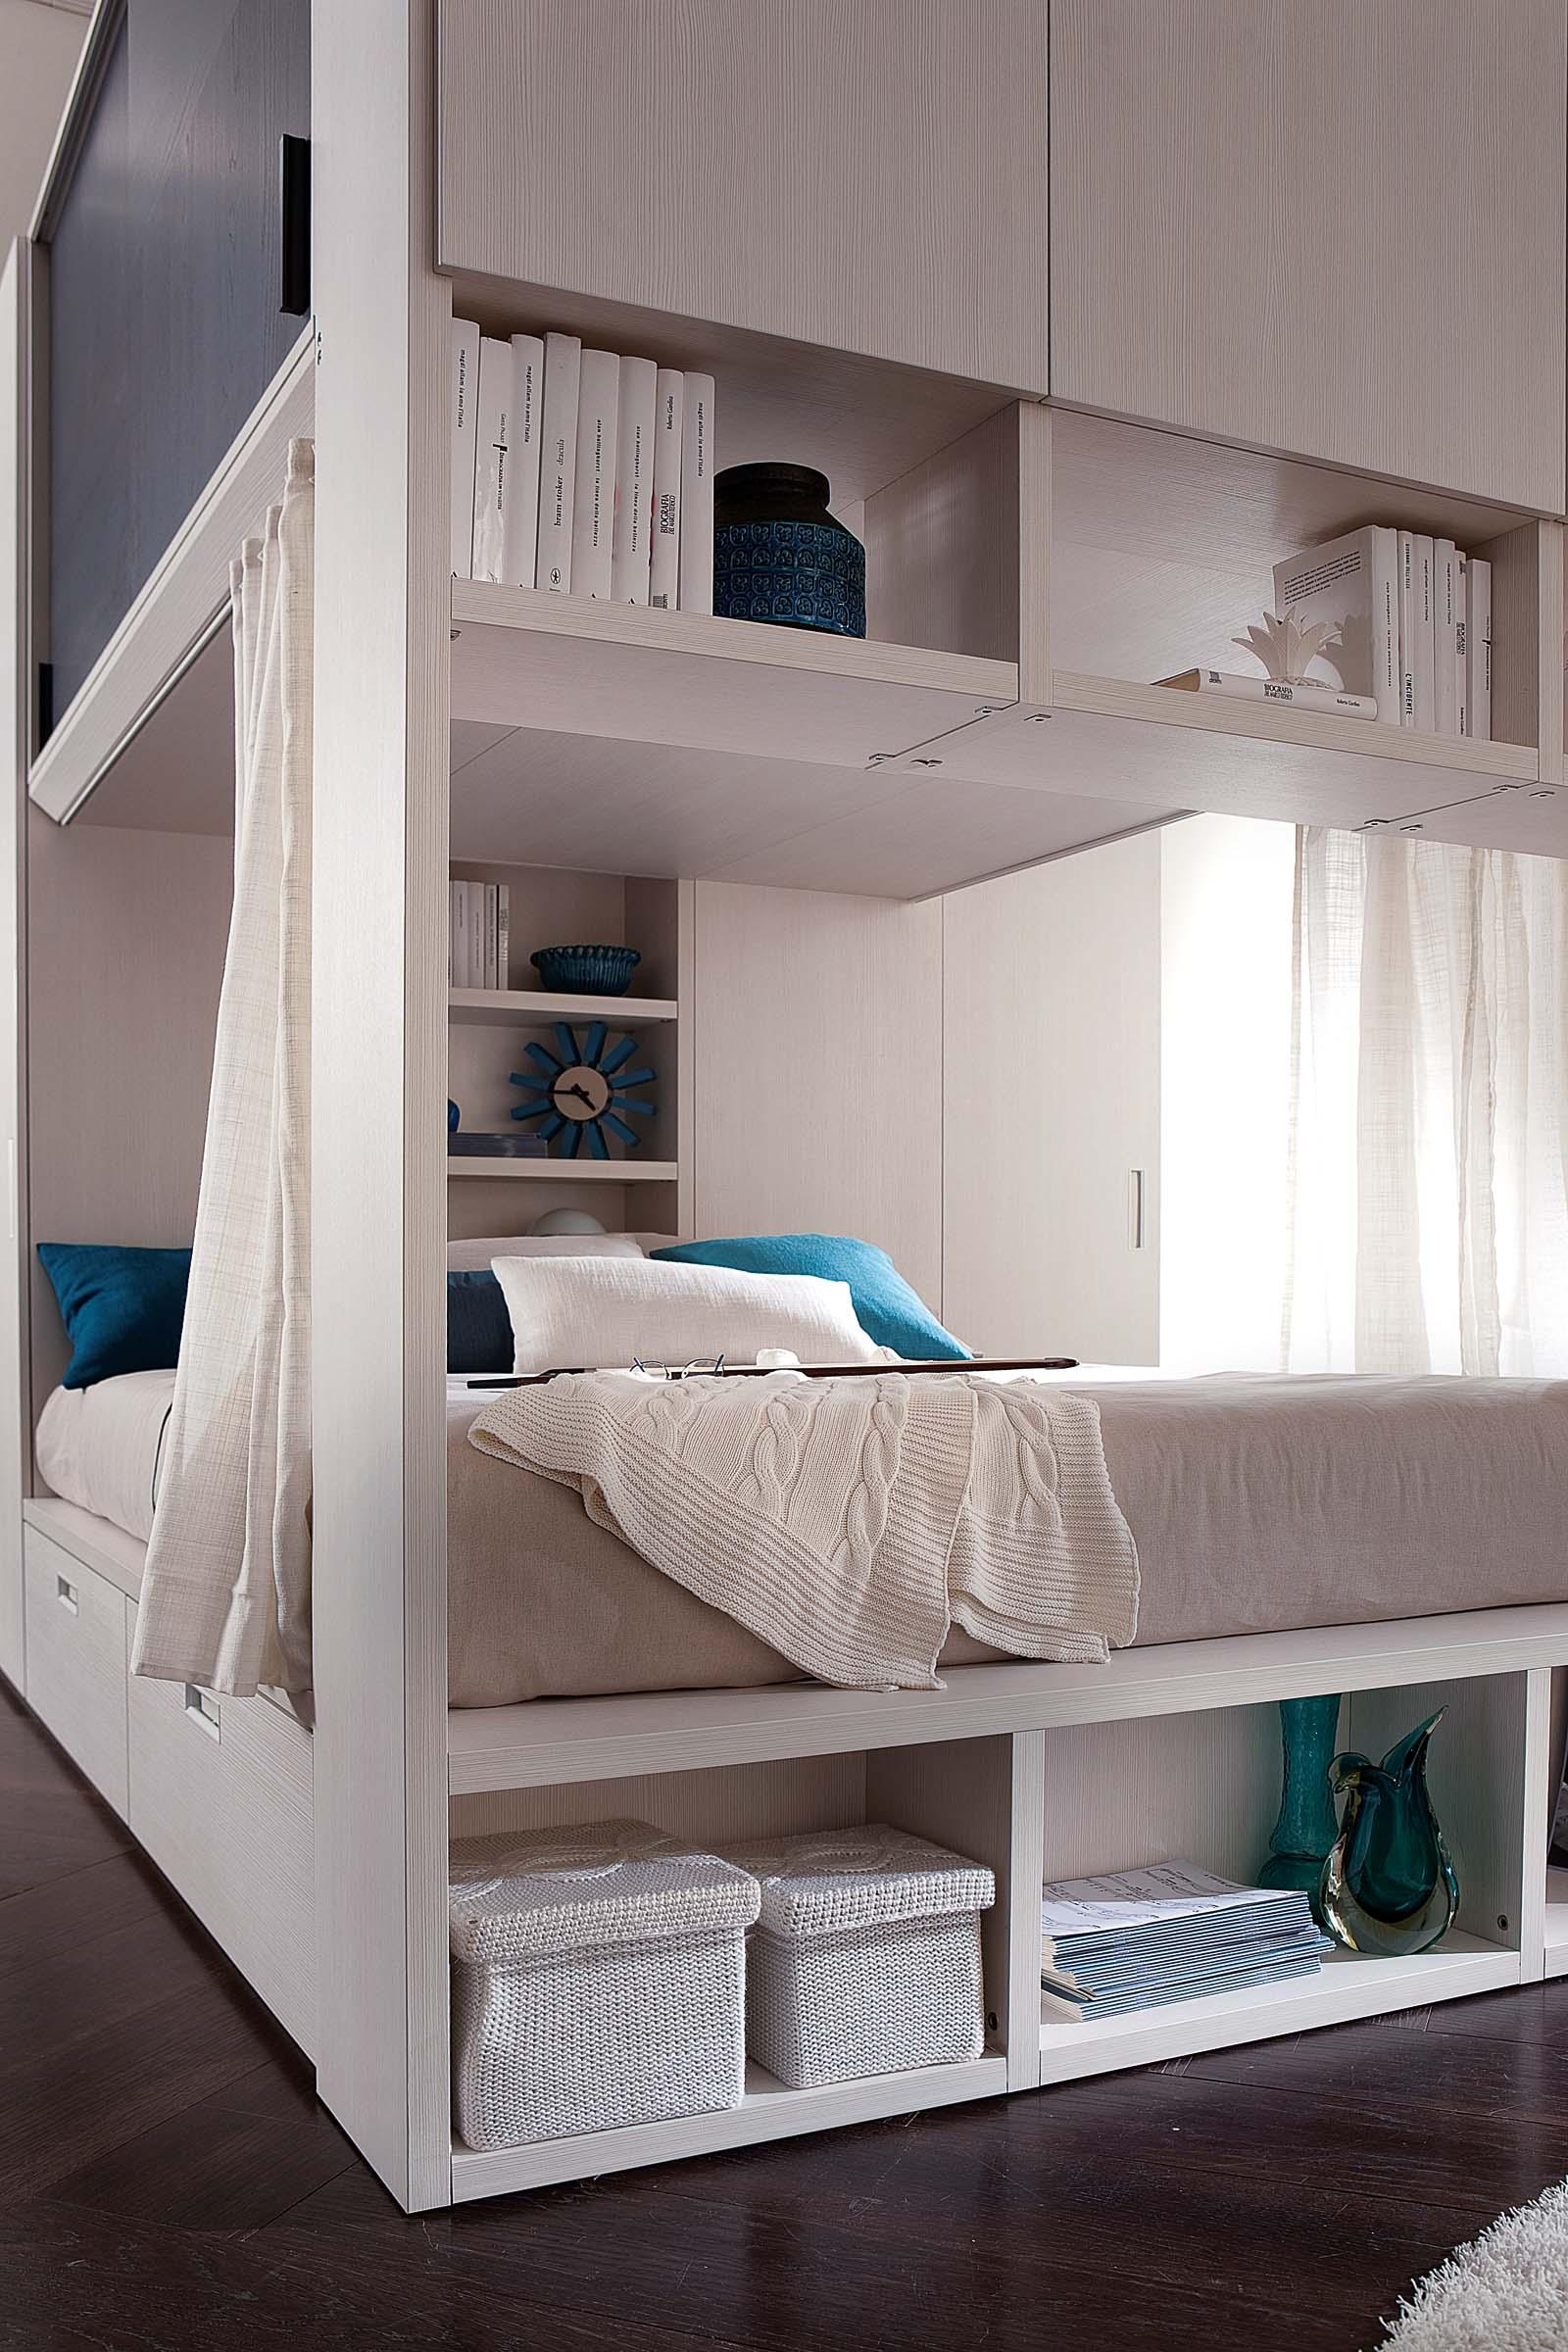 Camera componibile salvaspazio moderna top lops d27 for Camera da letto a ponte moderna